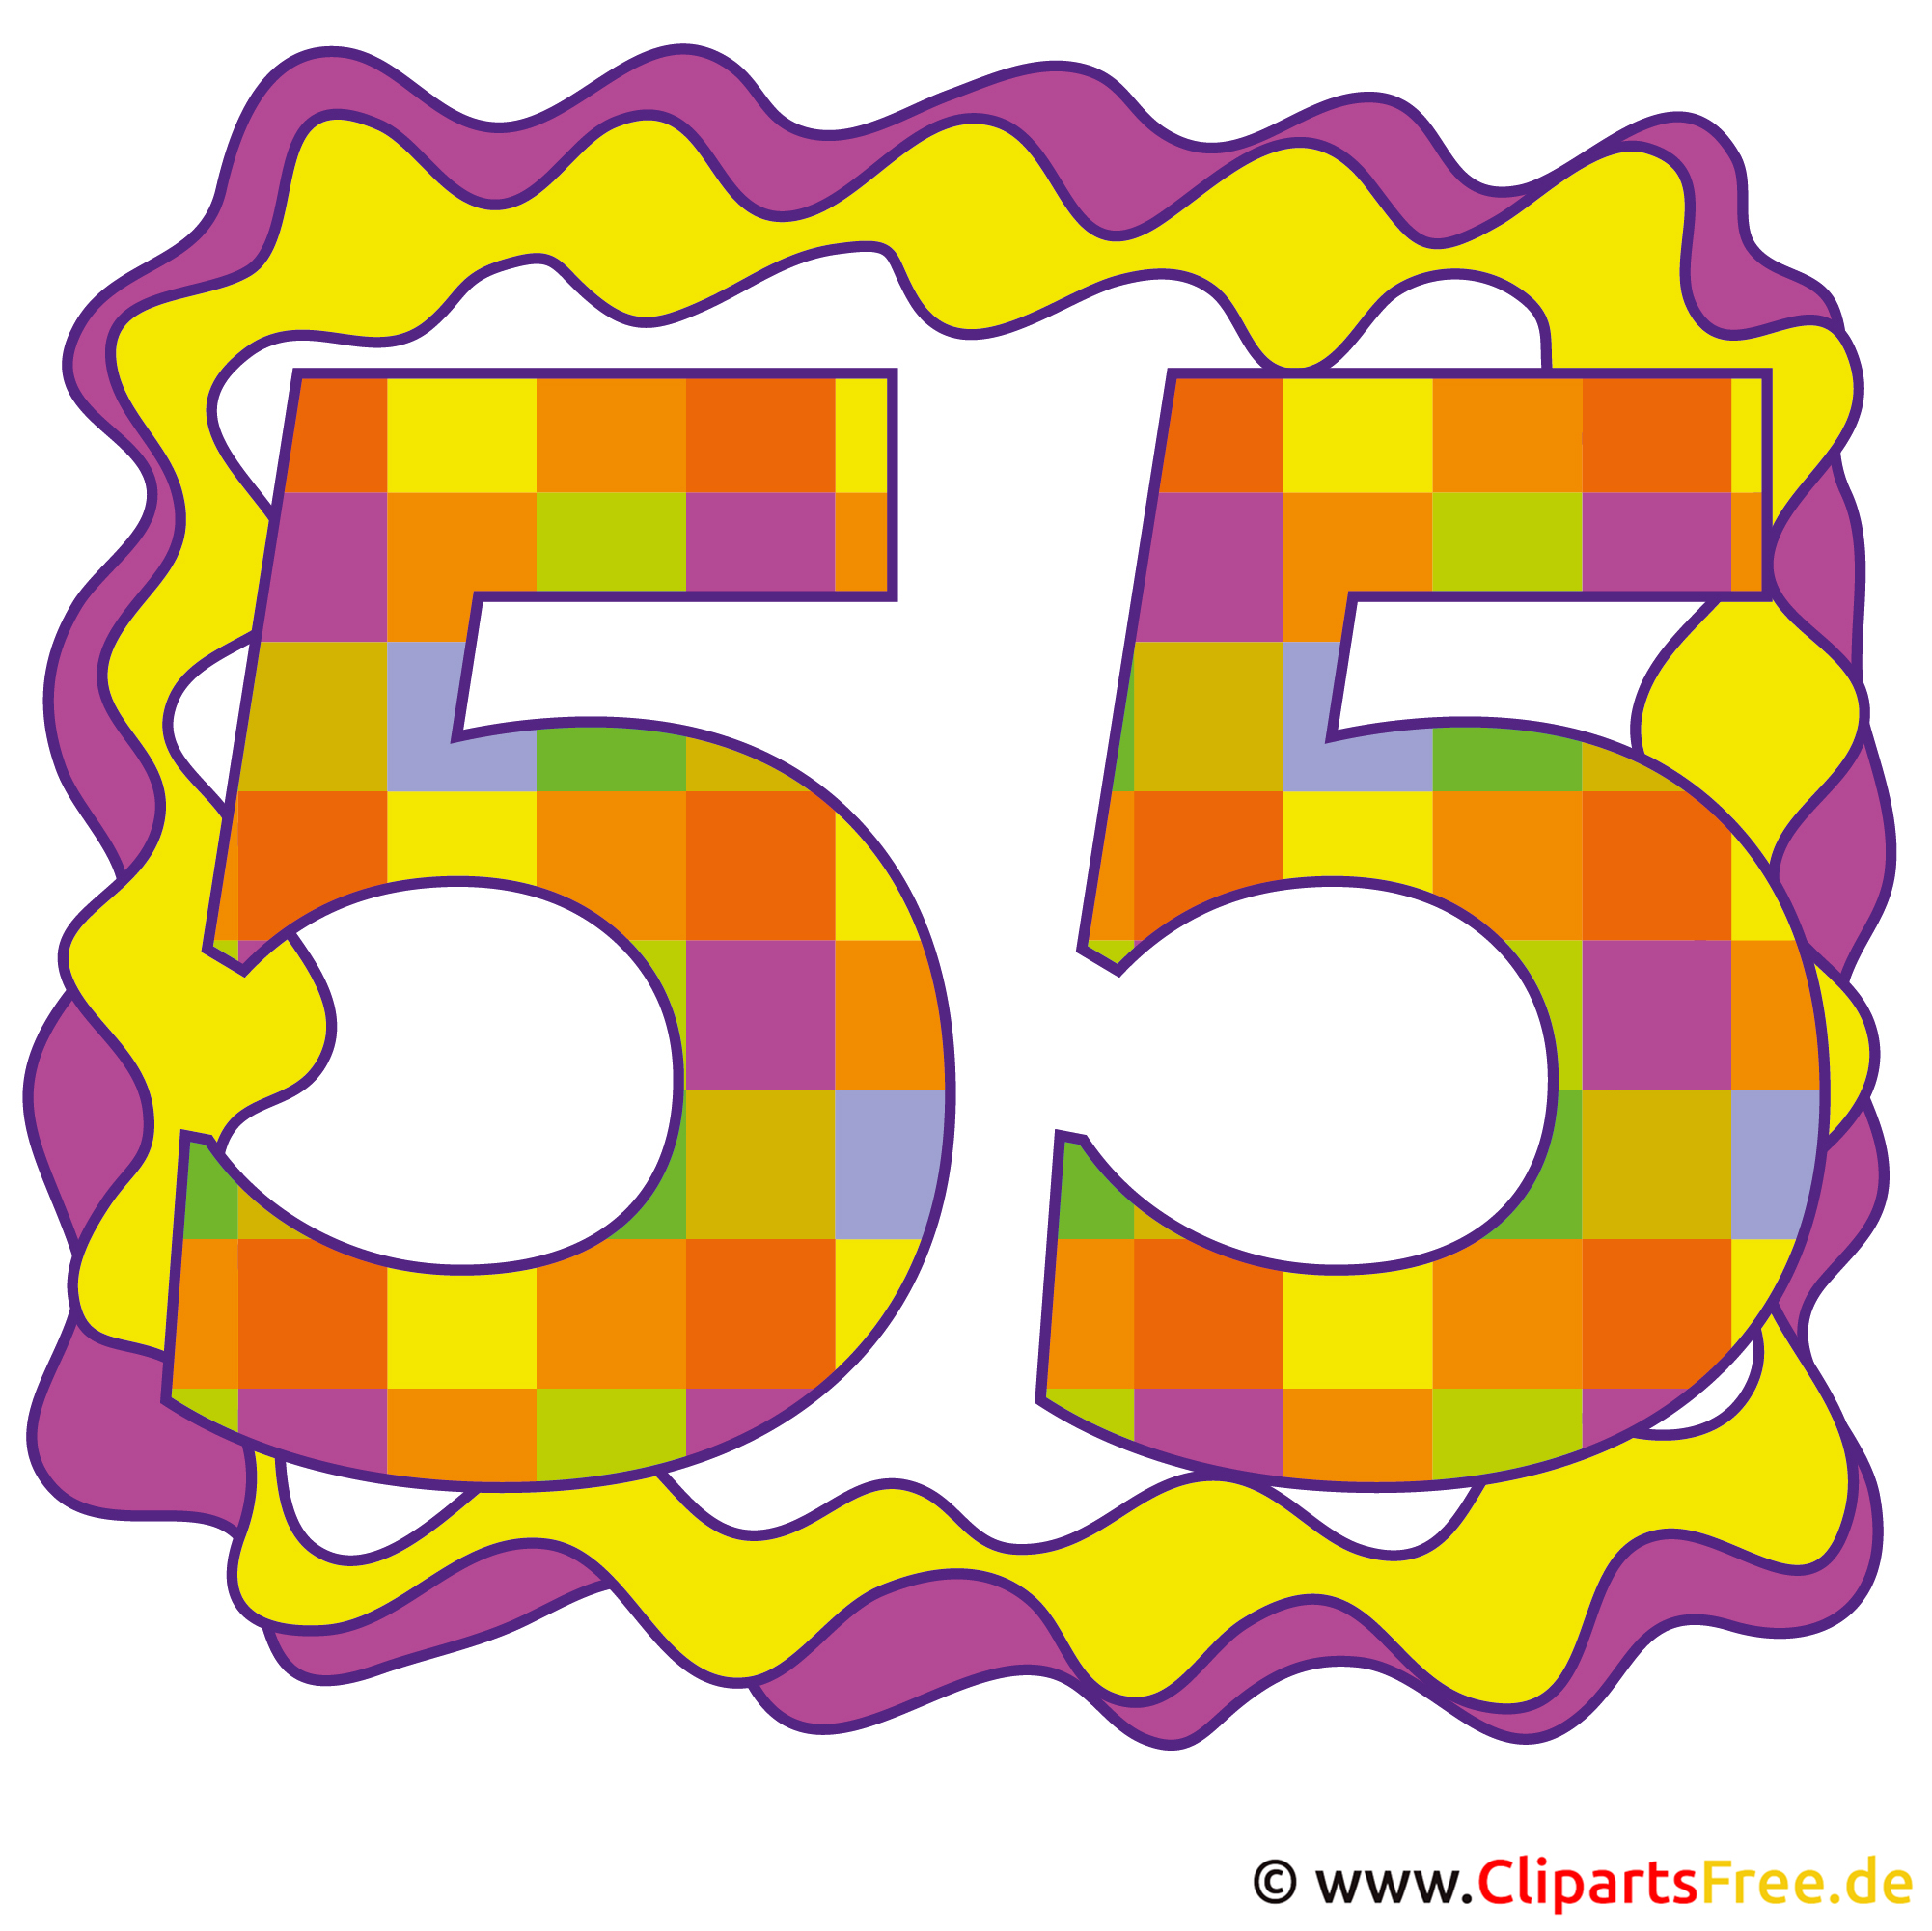 55 Glückwunschkarte, Bild, Clipart